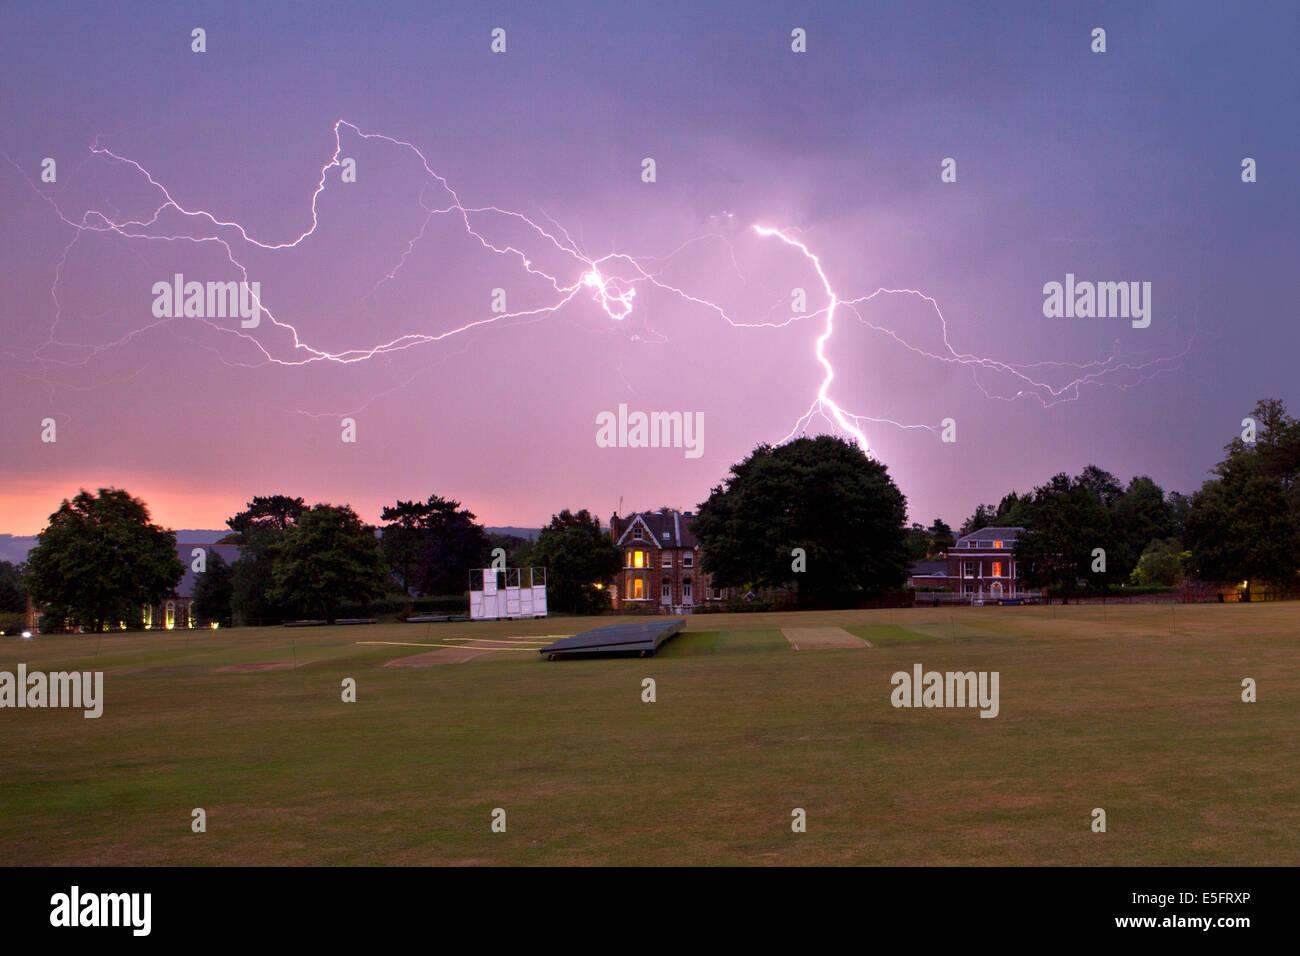 Lightning storm at dusk, The Vine cricket ground, Sevenoaks, Kent Stock Photo